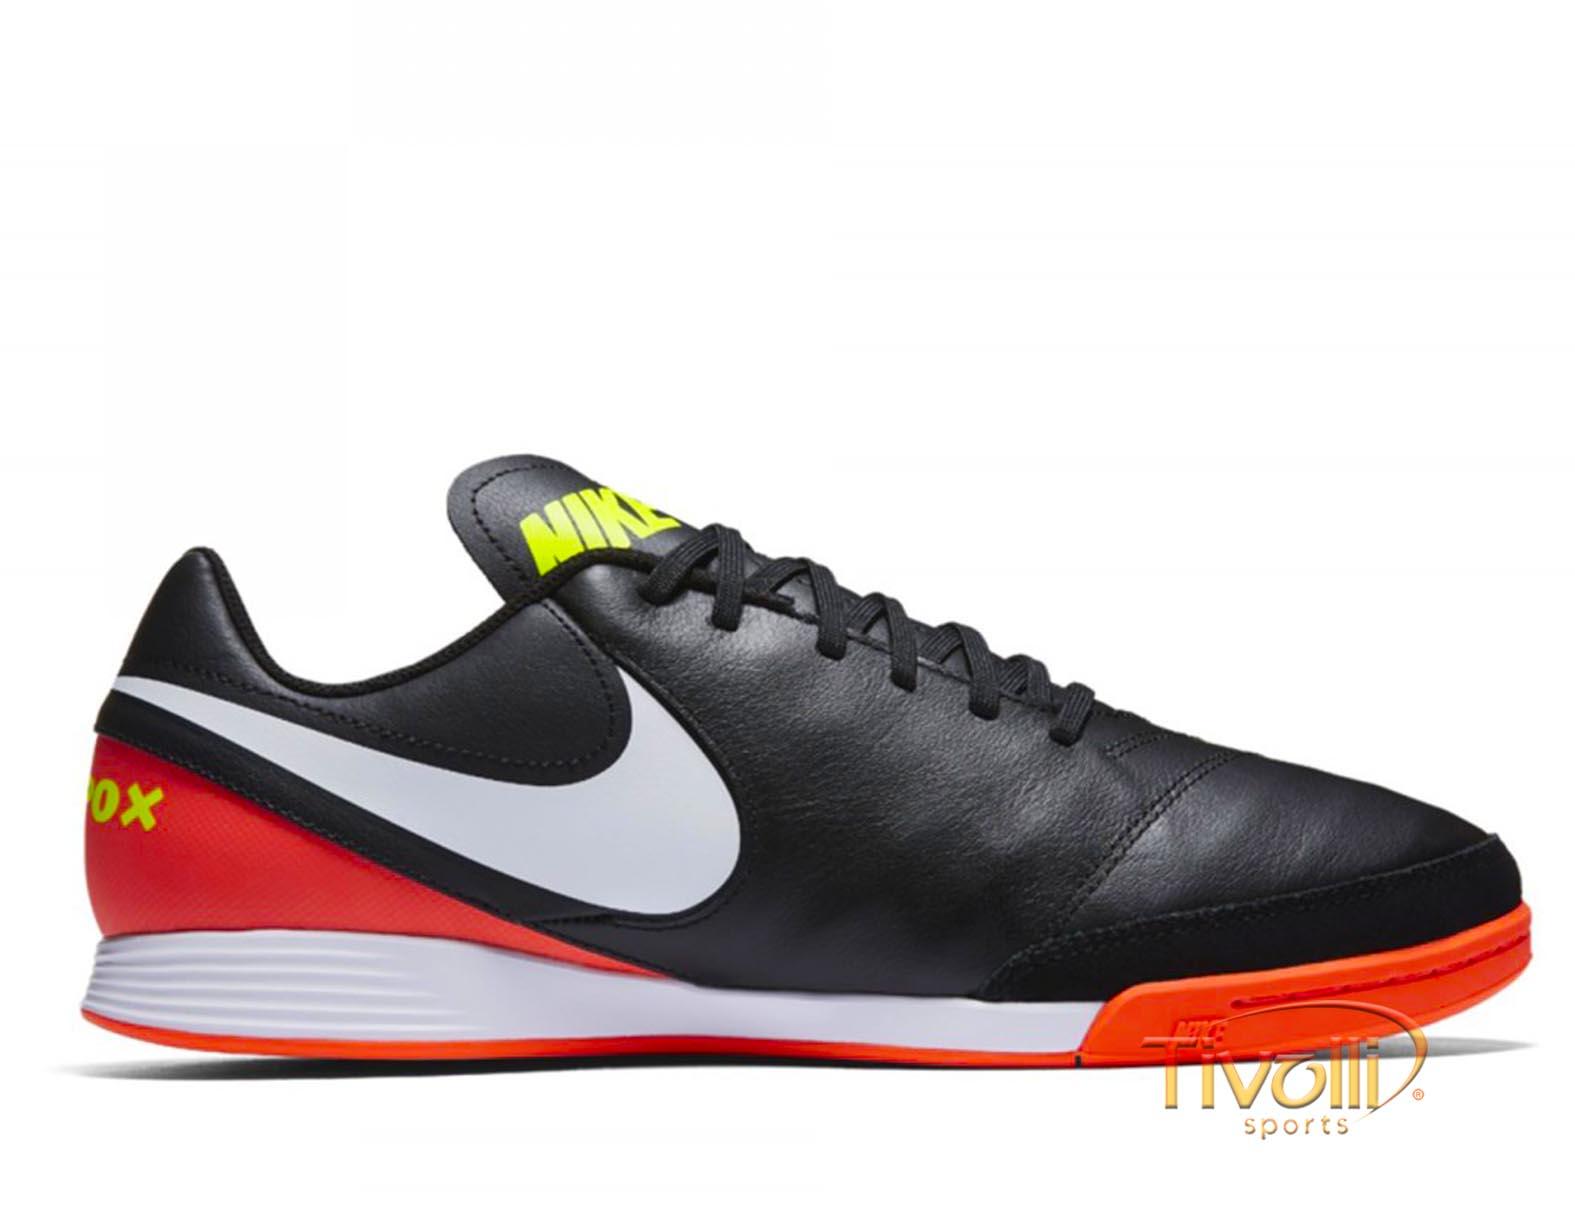 Chuteira Nike TiempoX Genio II Leather IC     e90cc1450fd94